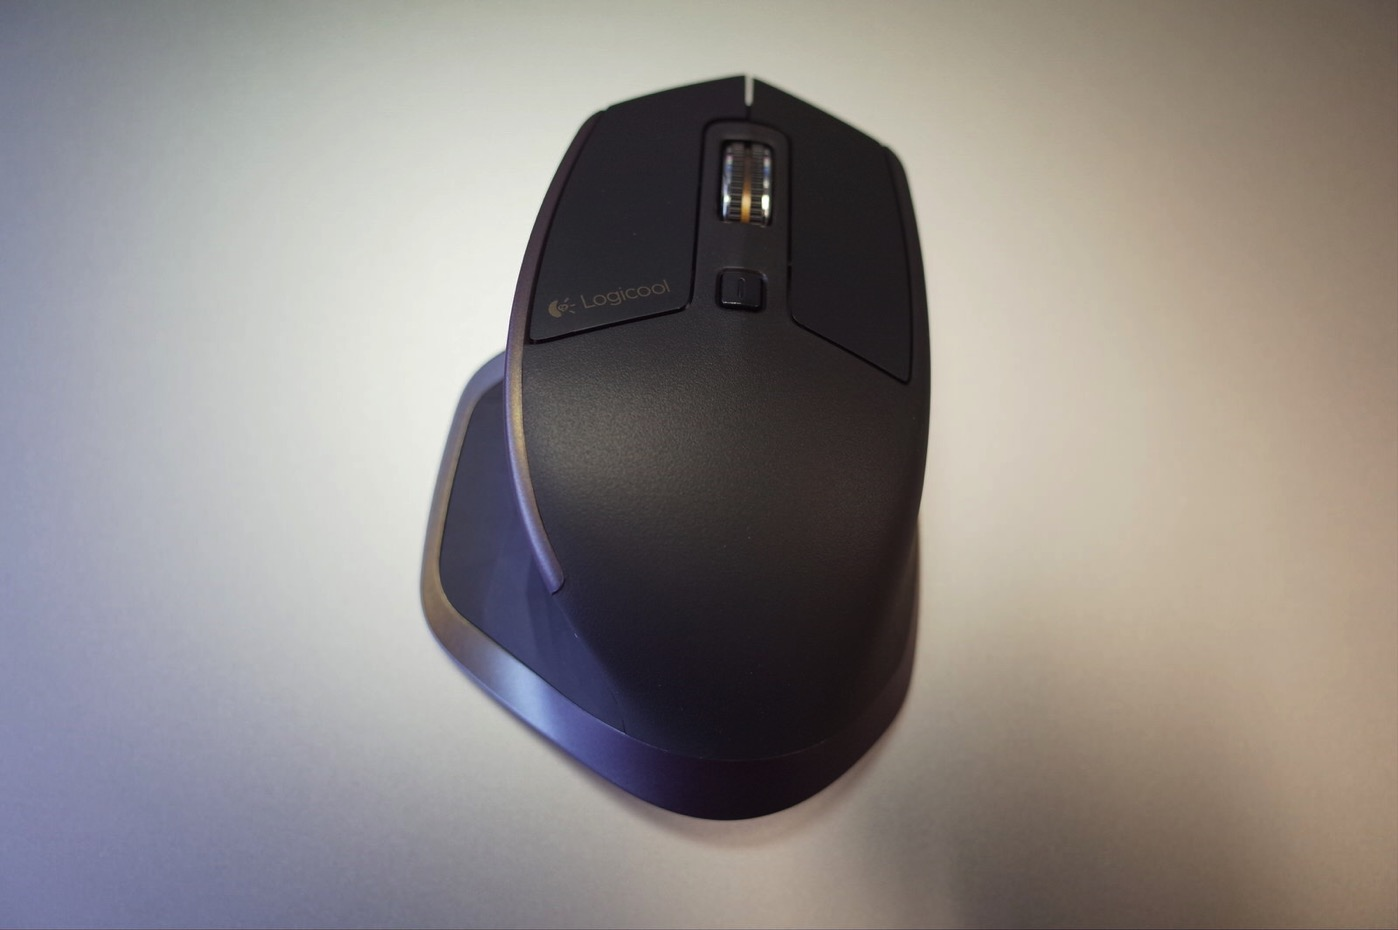 MX2000 MX Master ワイヤレスマウス-6